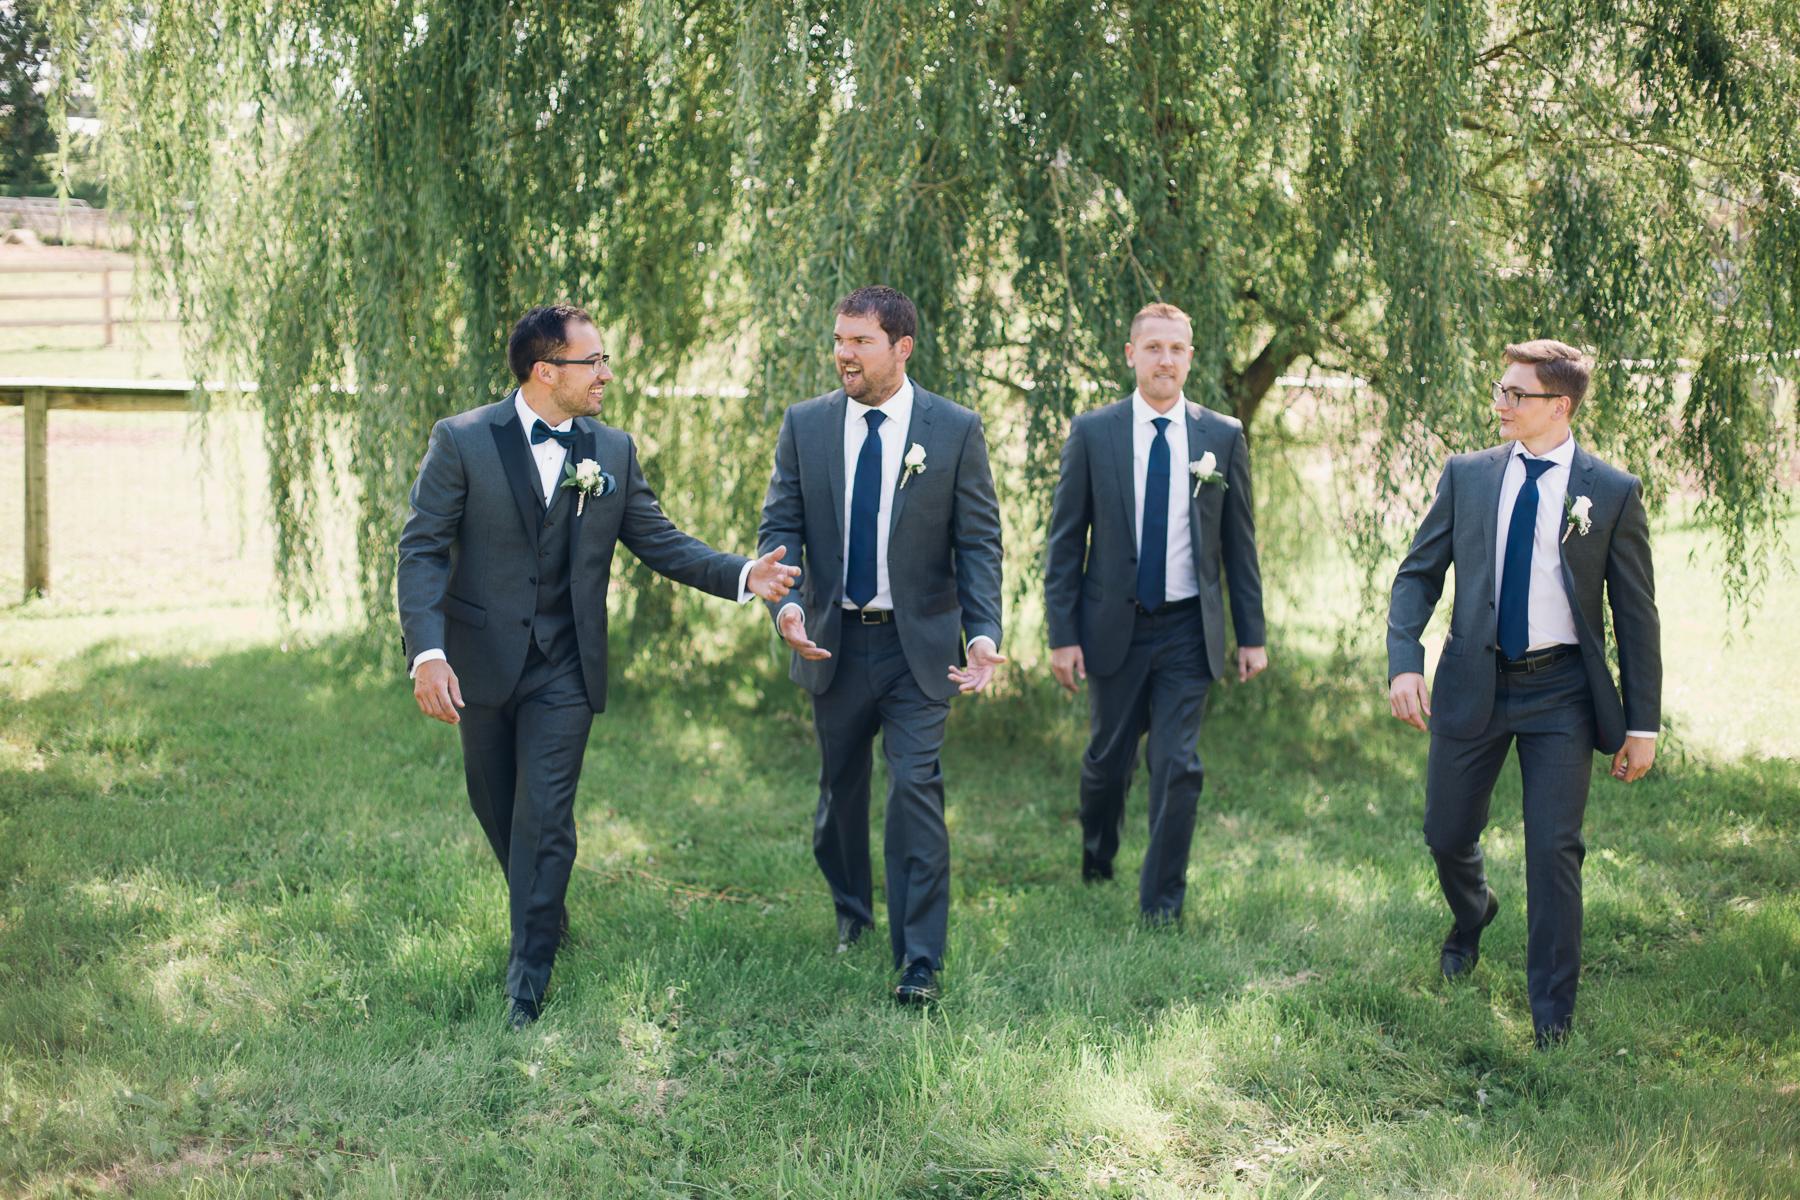 Waterstone_Estate_Equestrian Wedding (6 of 11)-2.jpg